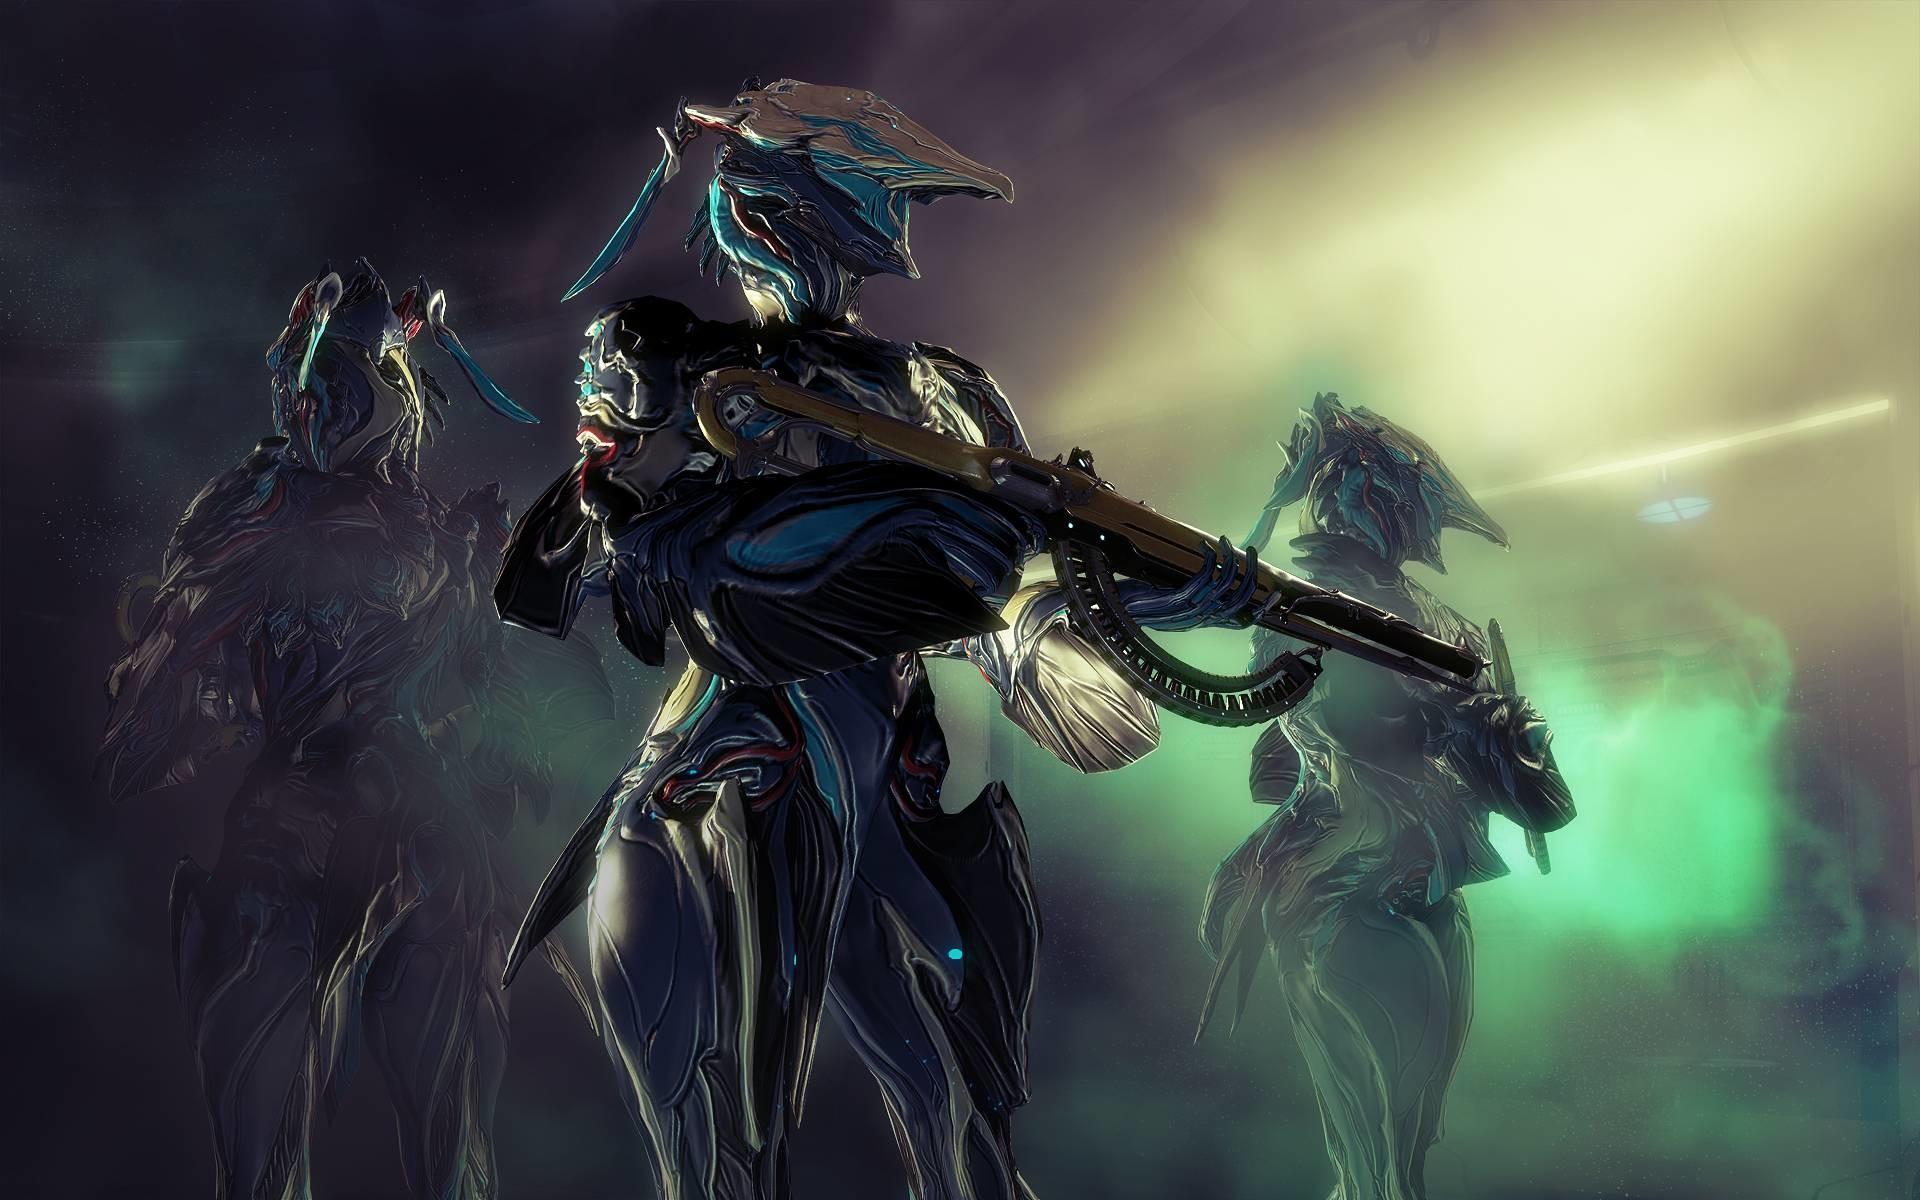 Warframe Loki Prime Wallpaper – WallpaperSafari